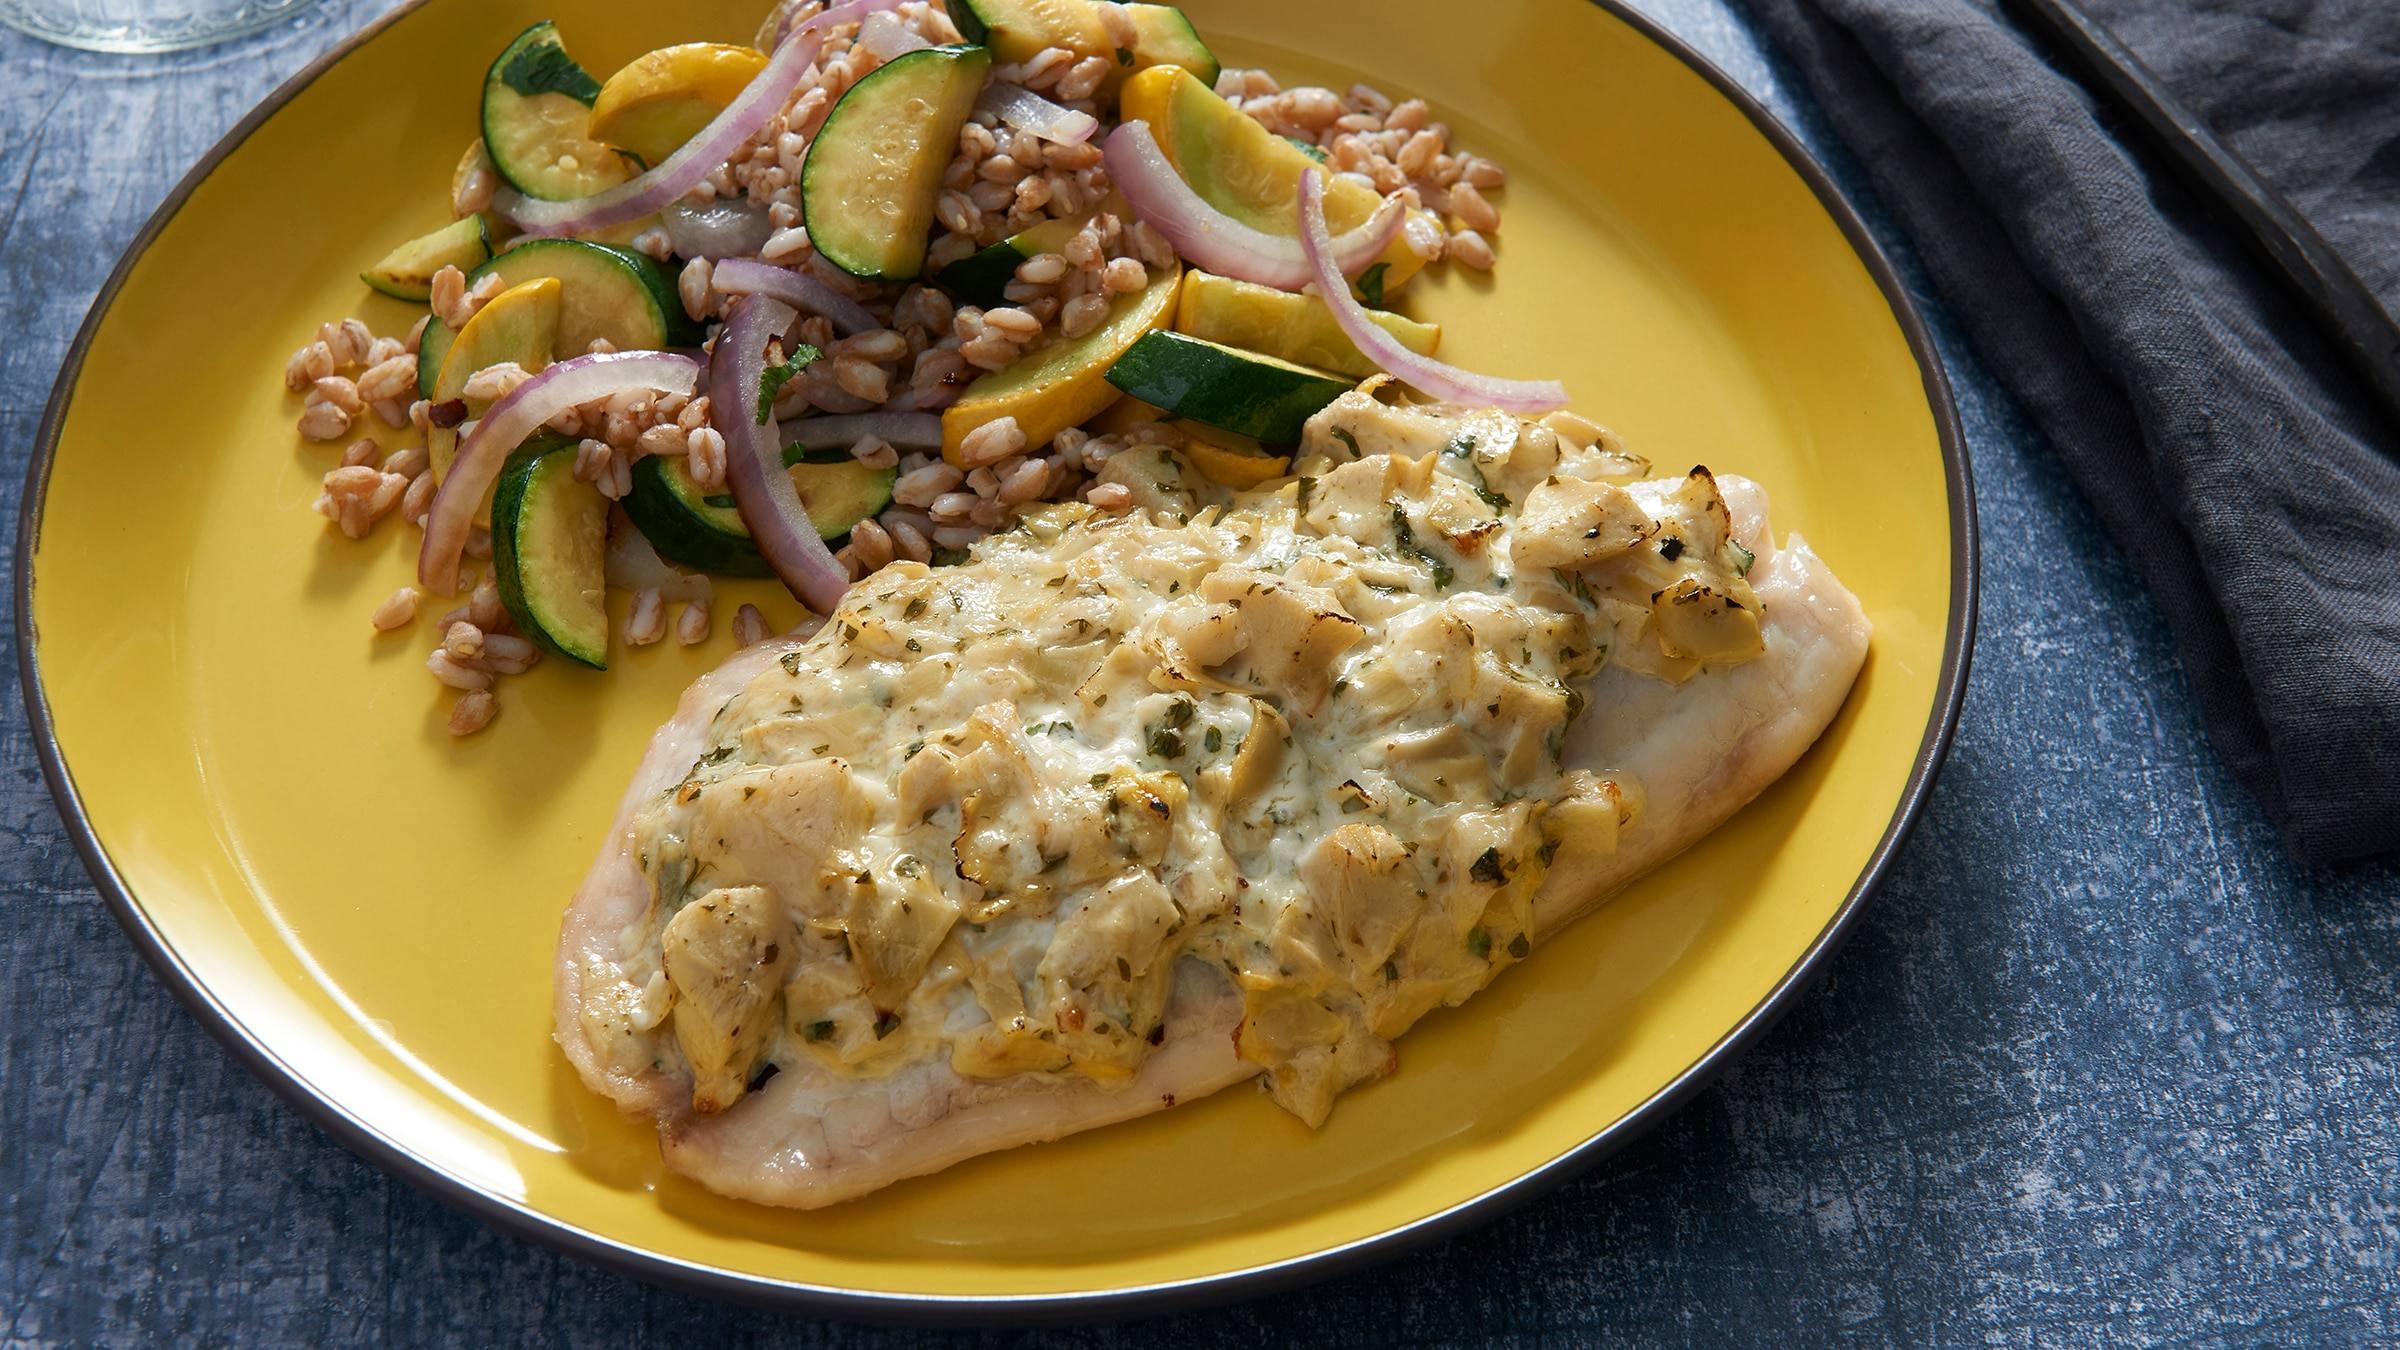 Artichoke-Crusted Tilapia Fillets Recipe